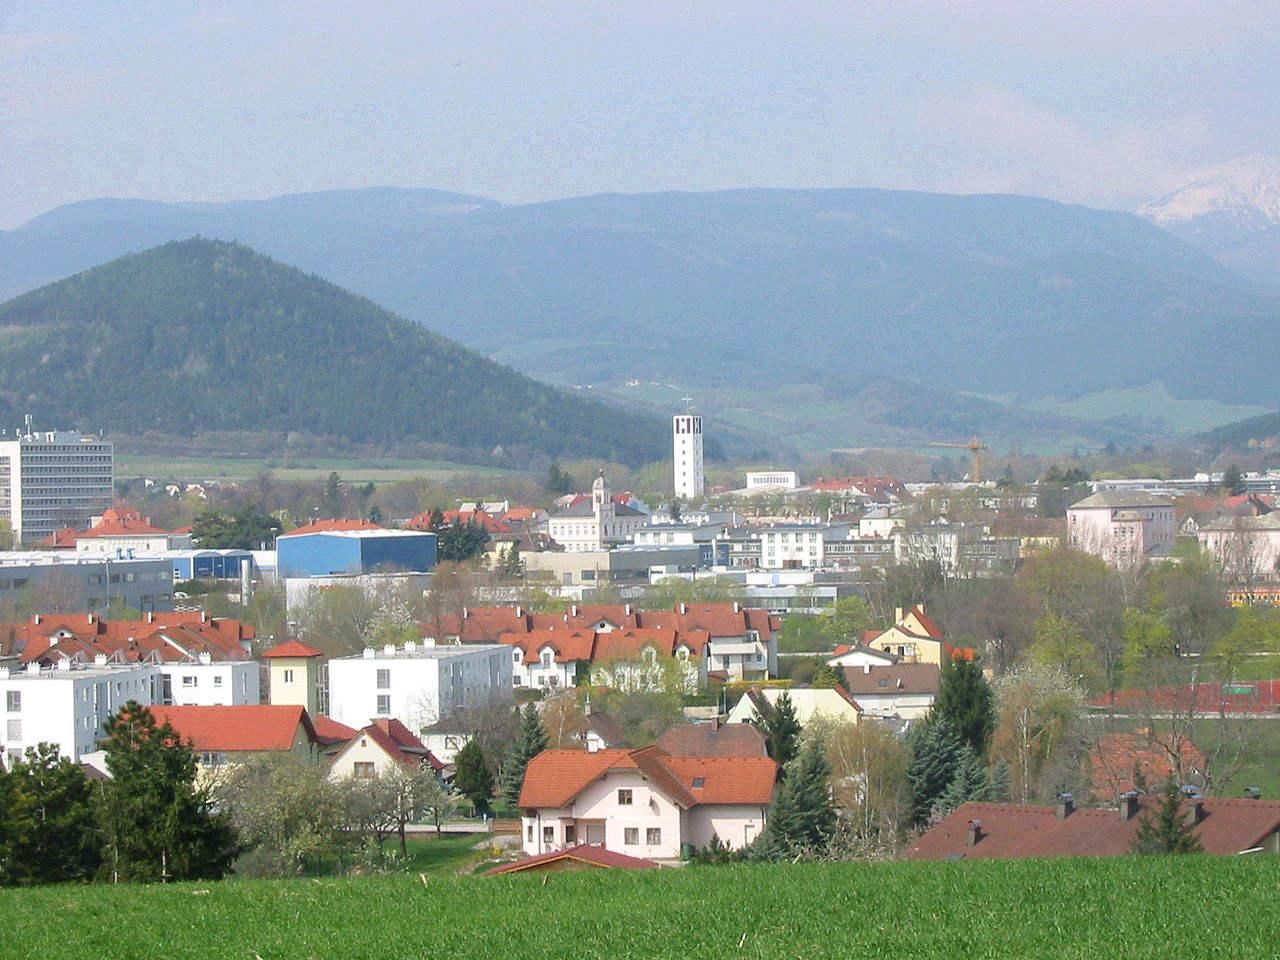 Transport - Ternitz